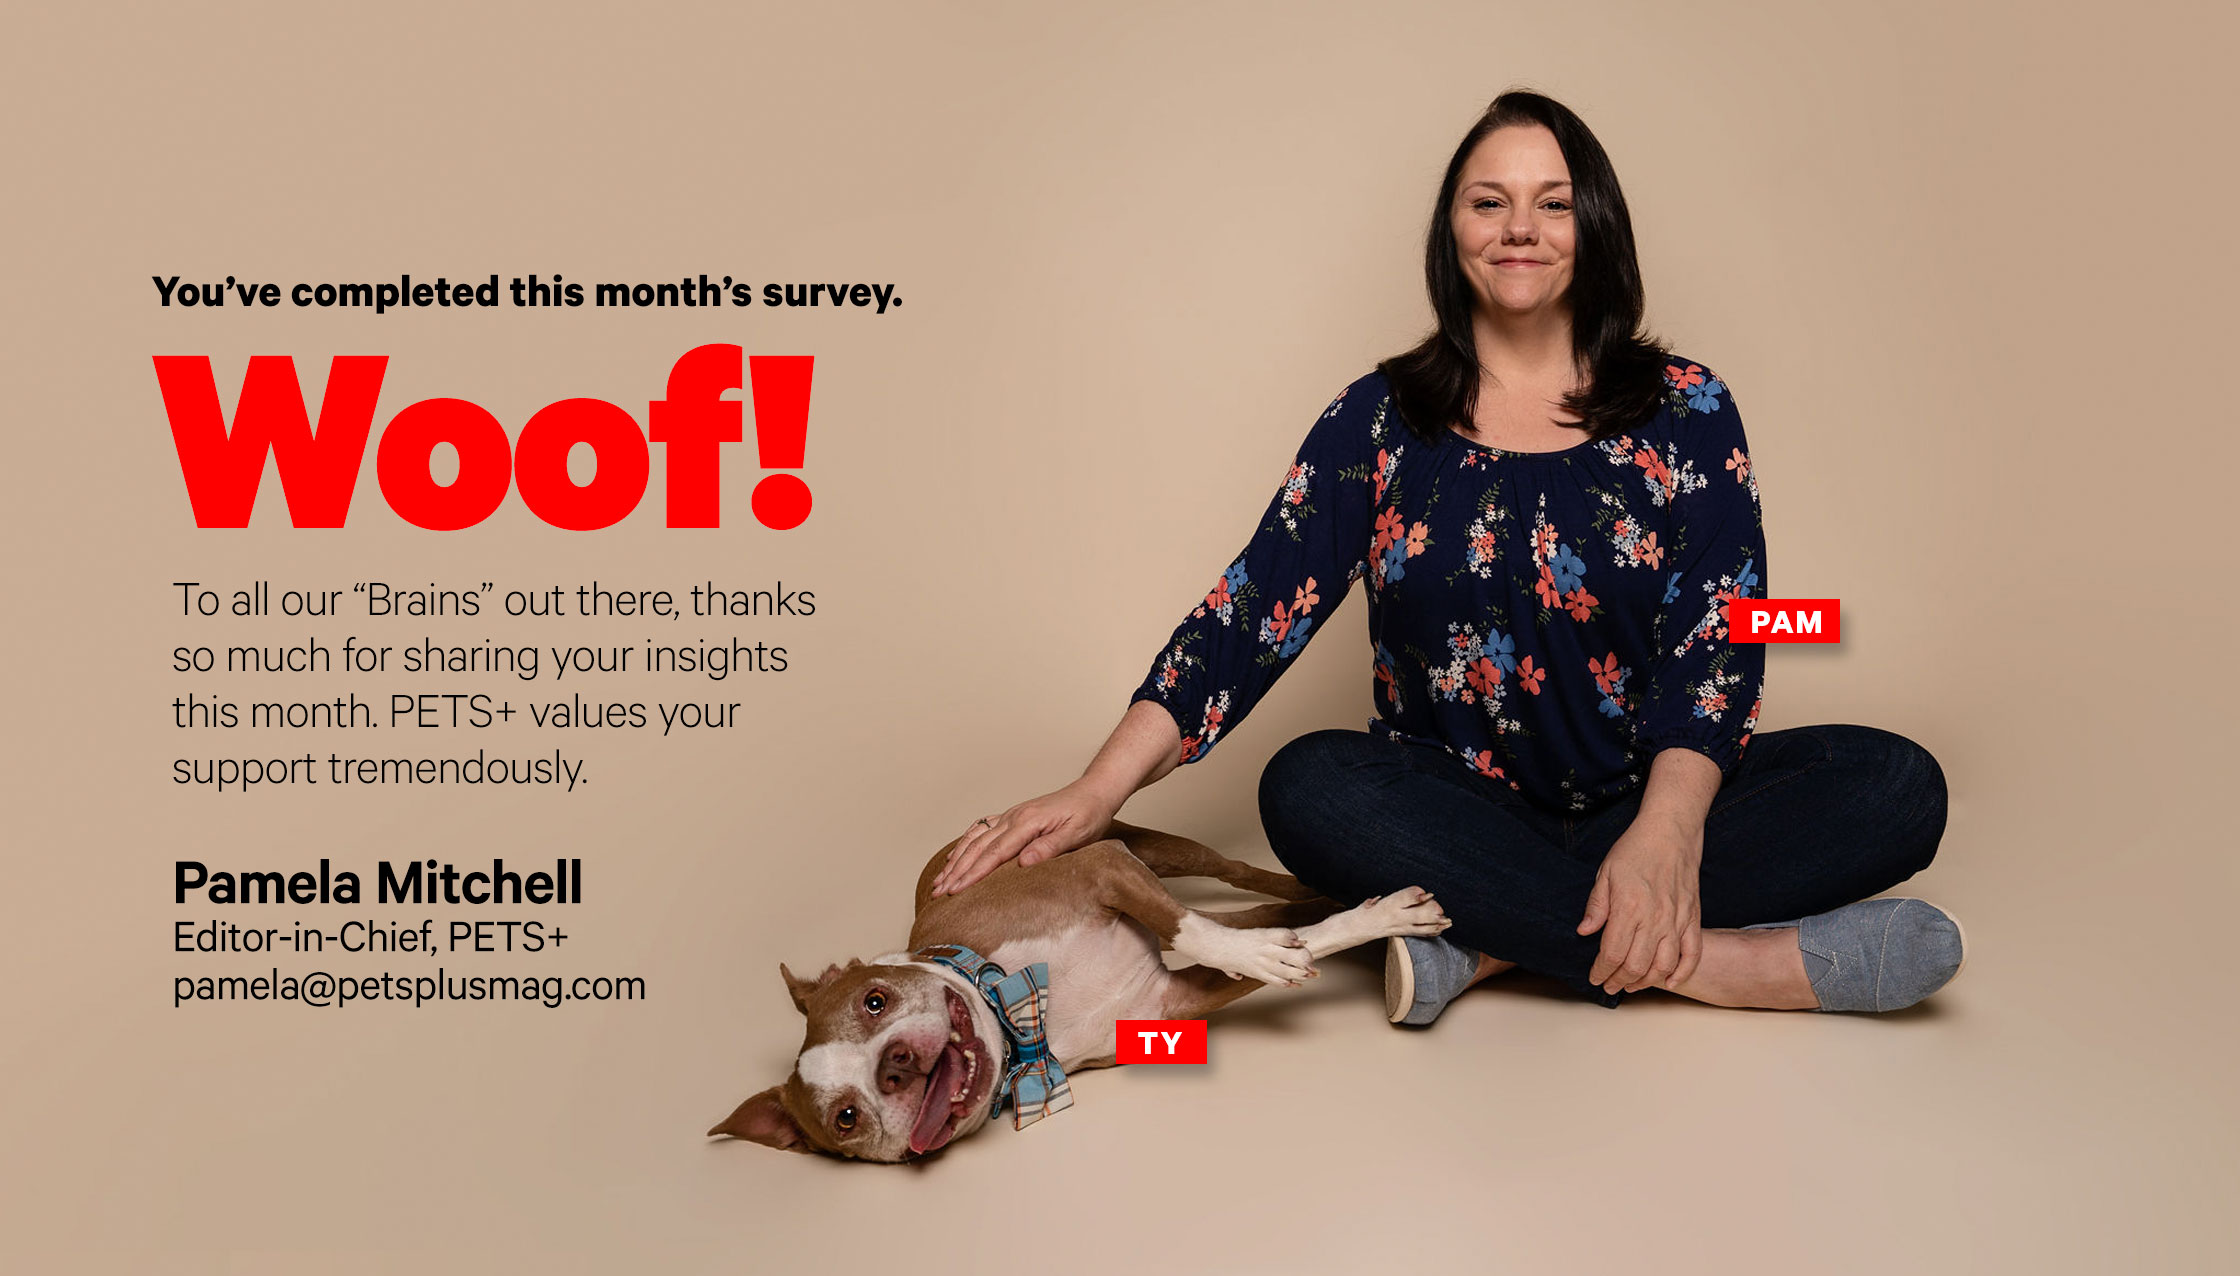 Pamela Mitchell, editor of PETS+